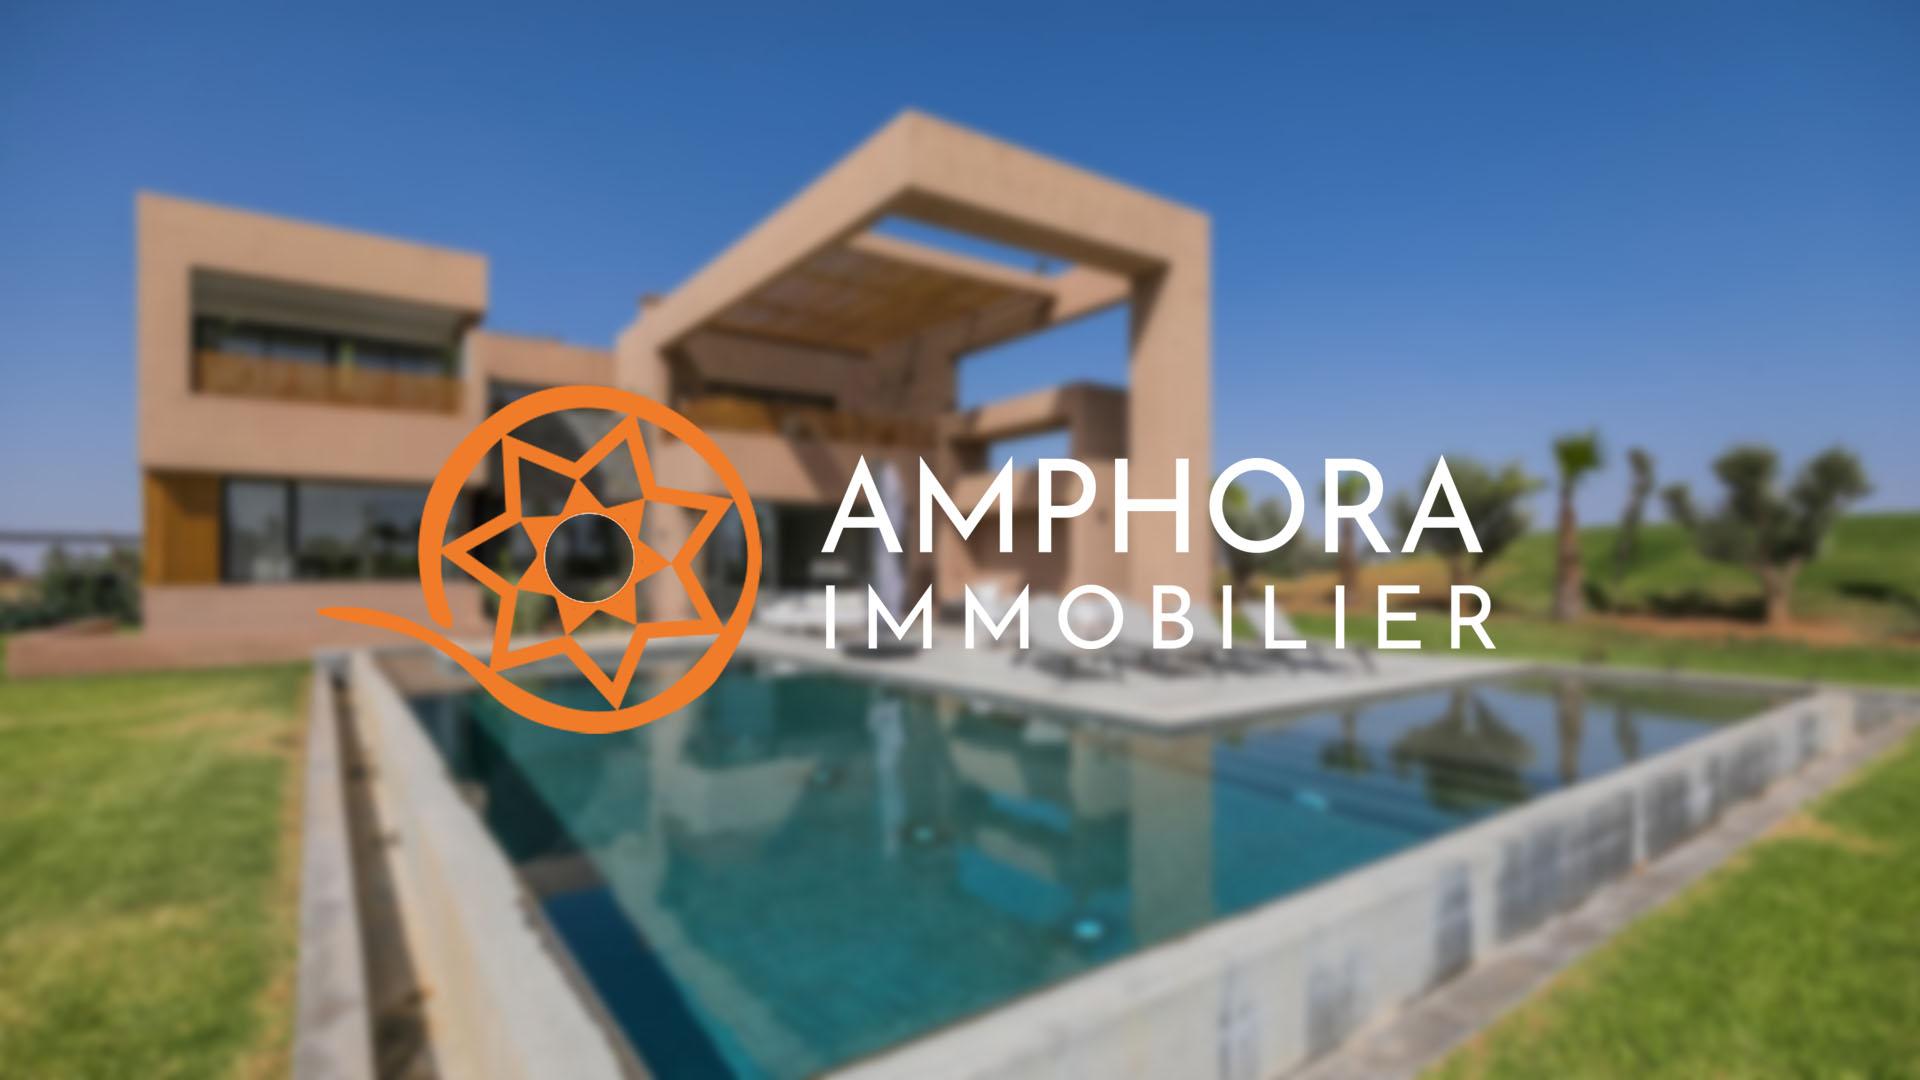 Vente appartement Marrakech - Amphora Immobilier